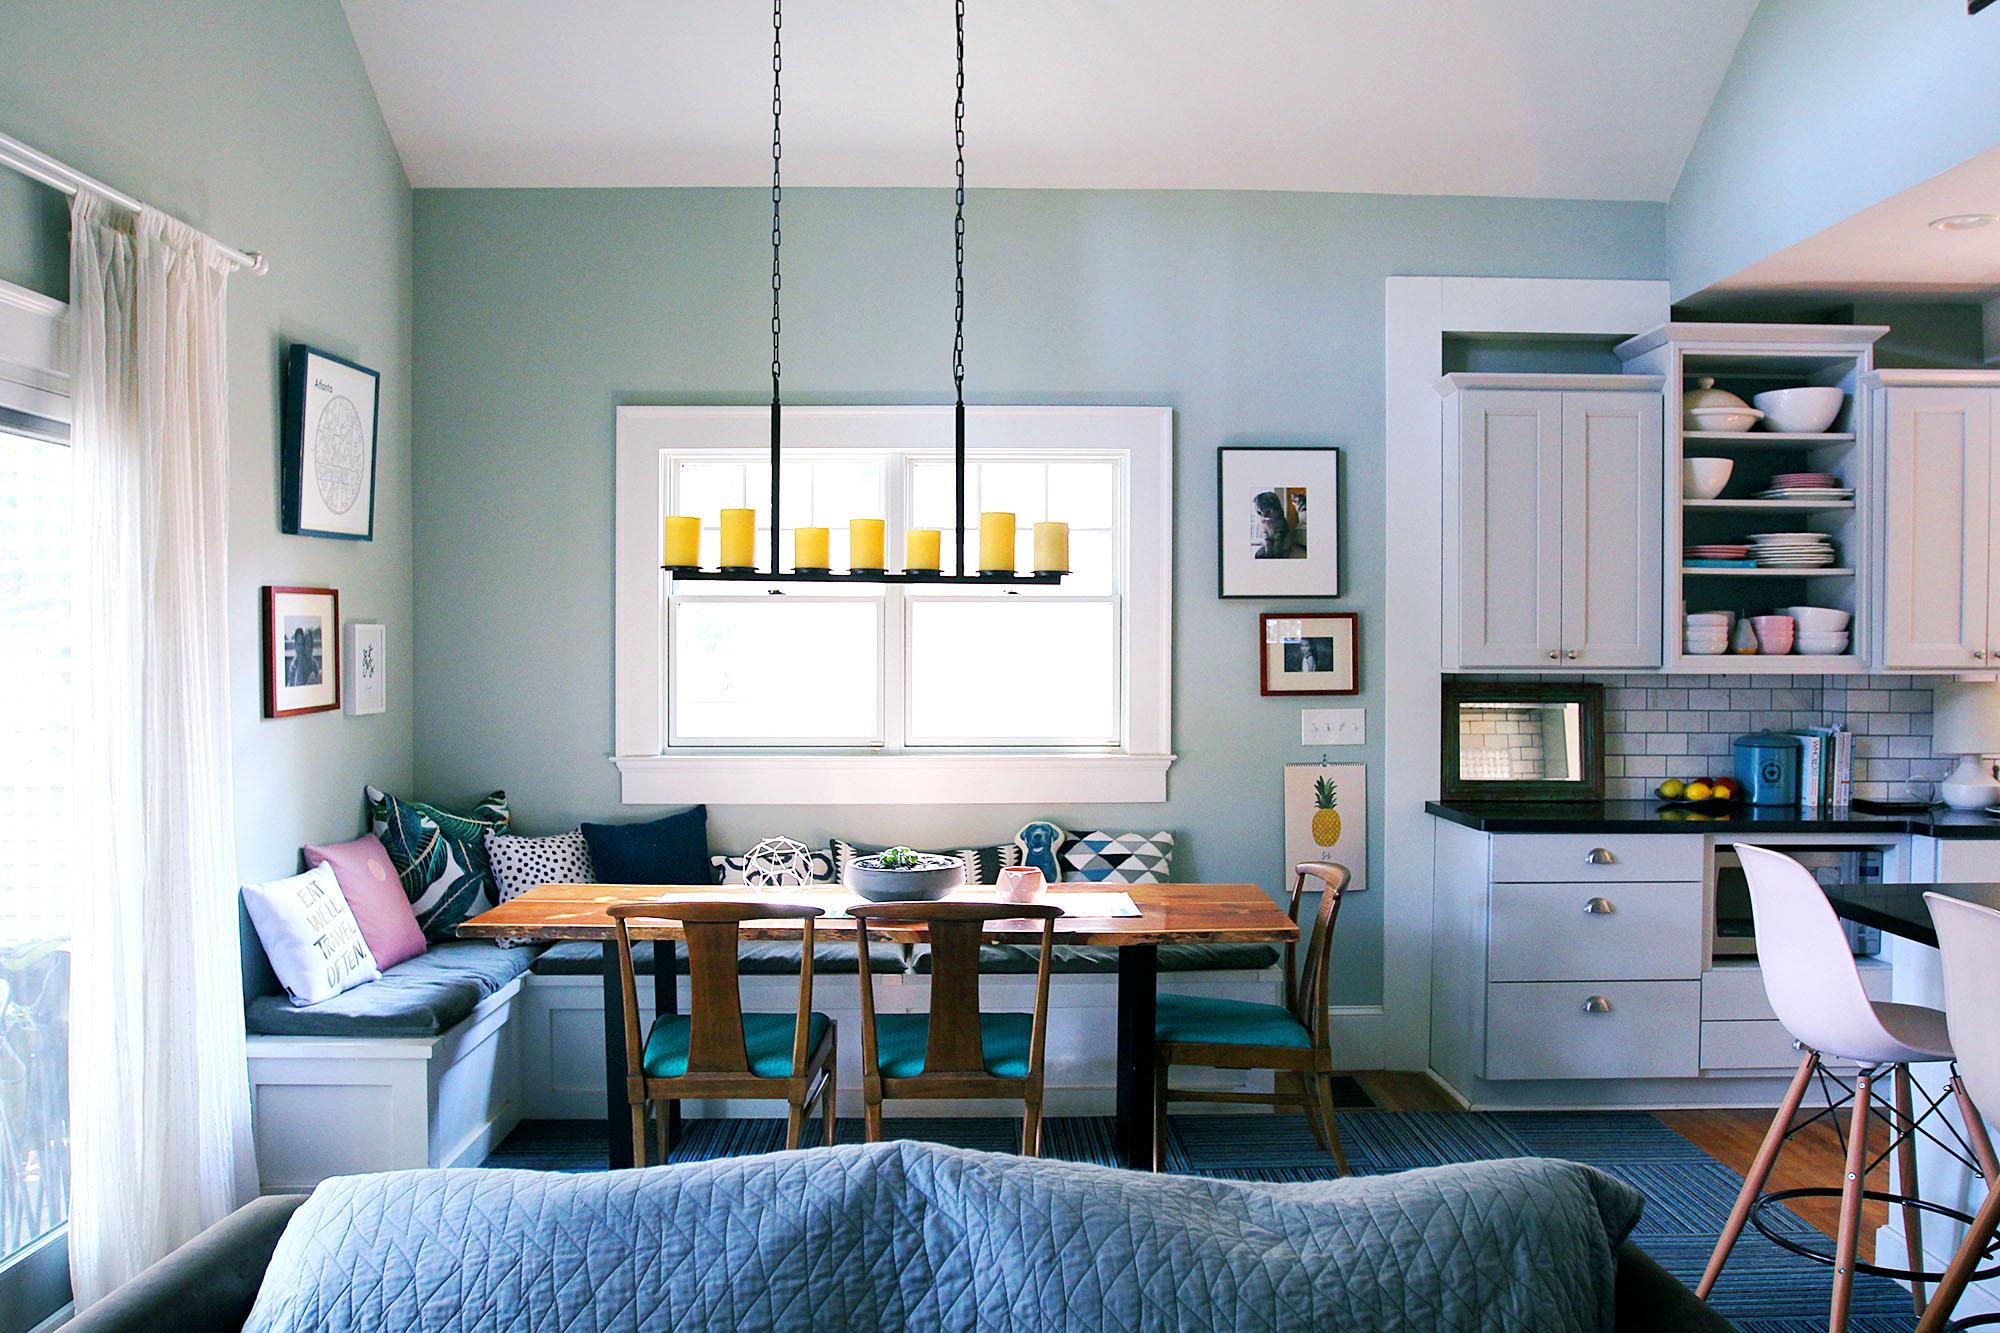 jo-torrijos-a-simpler-design-atlanta-modern-great-room-4.jpg